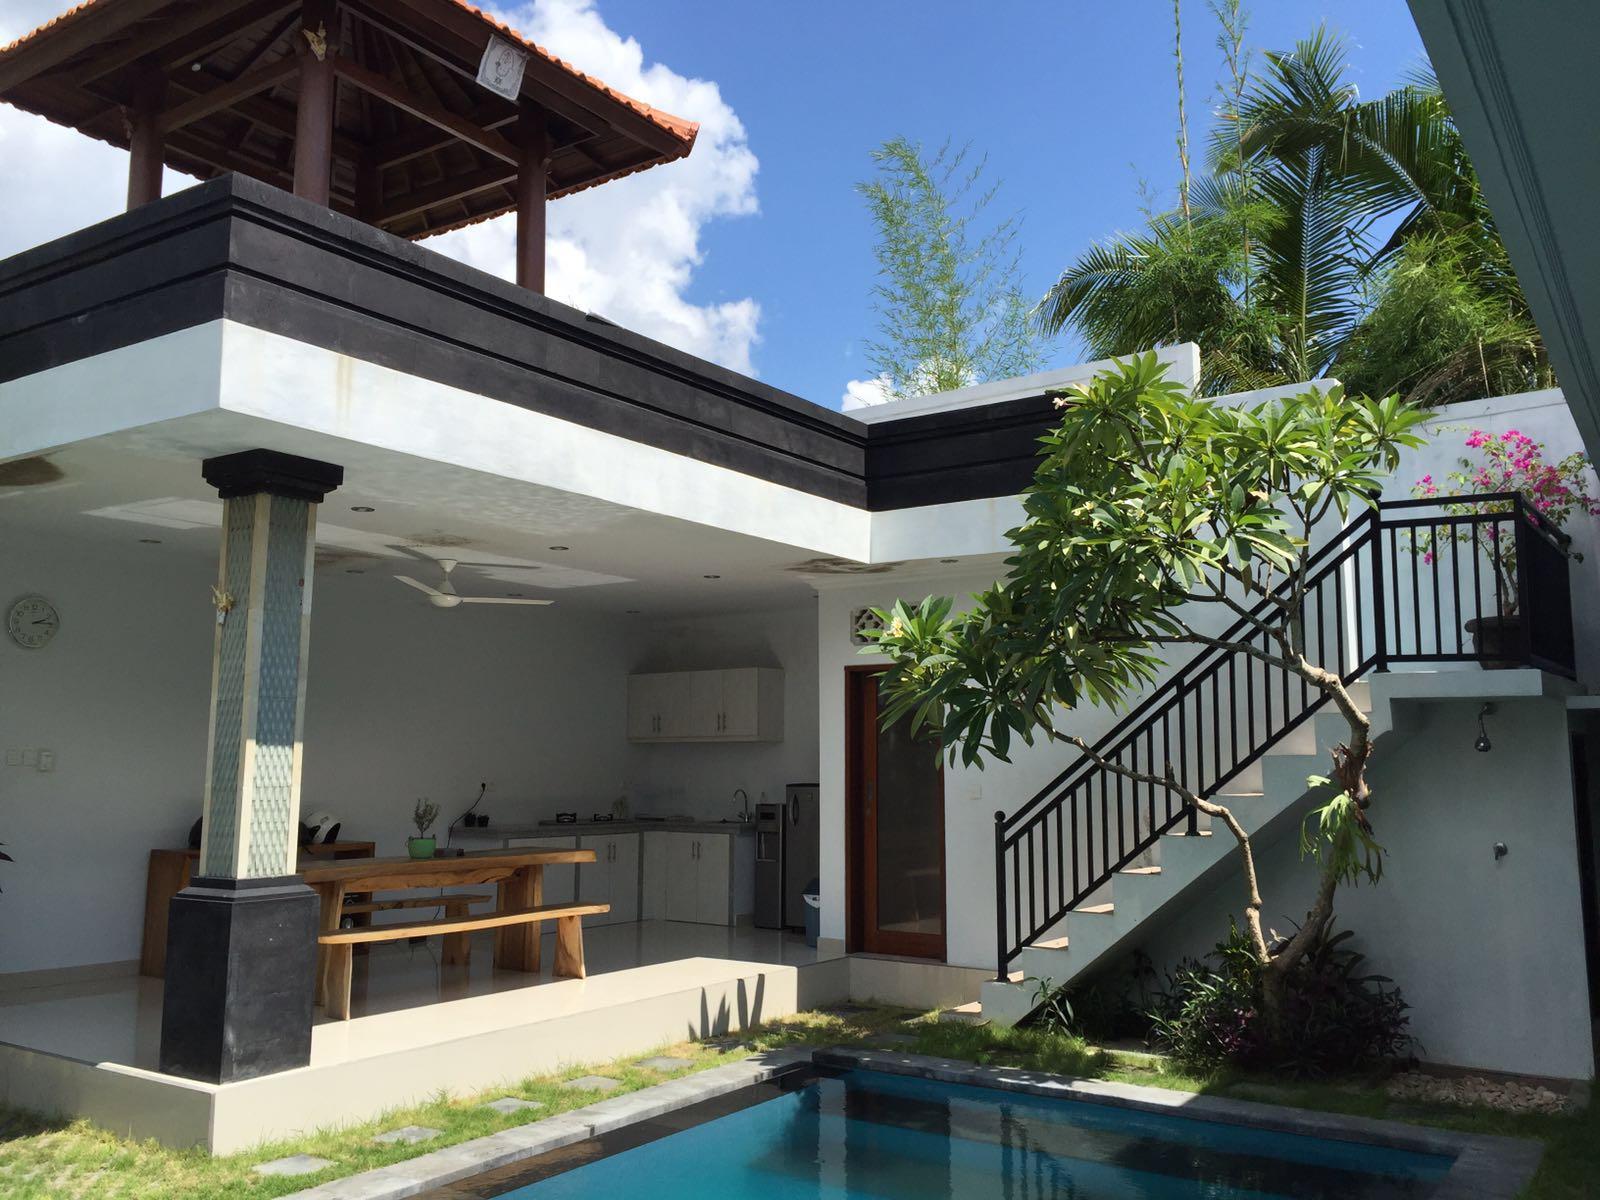 SurfWG Bali surf camp villa tuju accommodation kitchen and rooftop